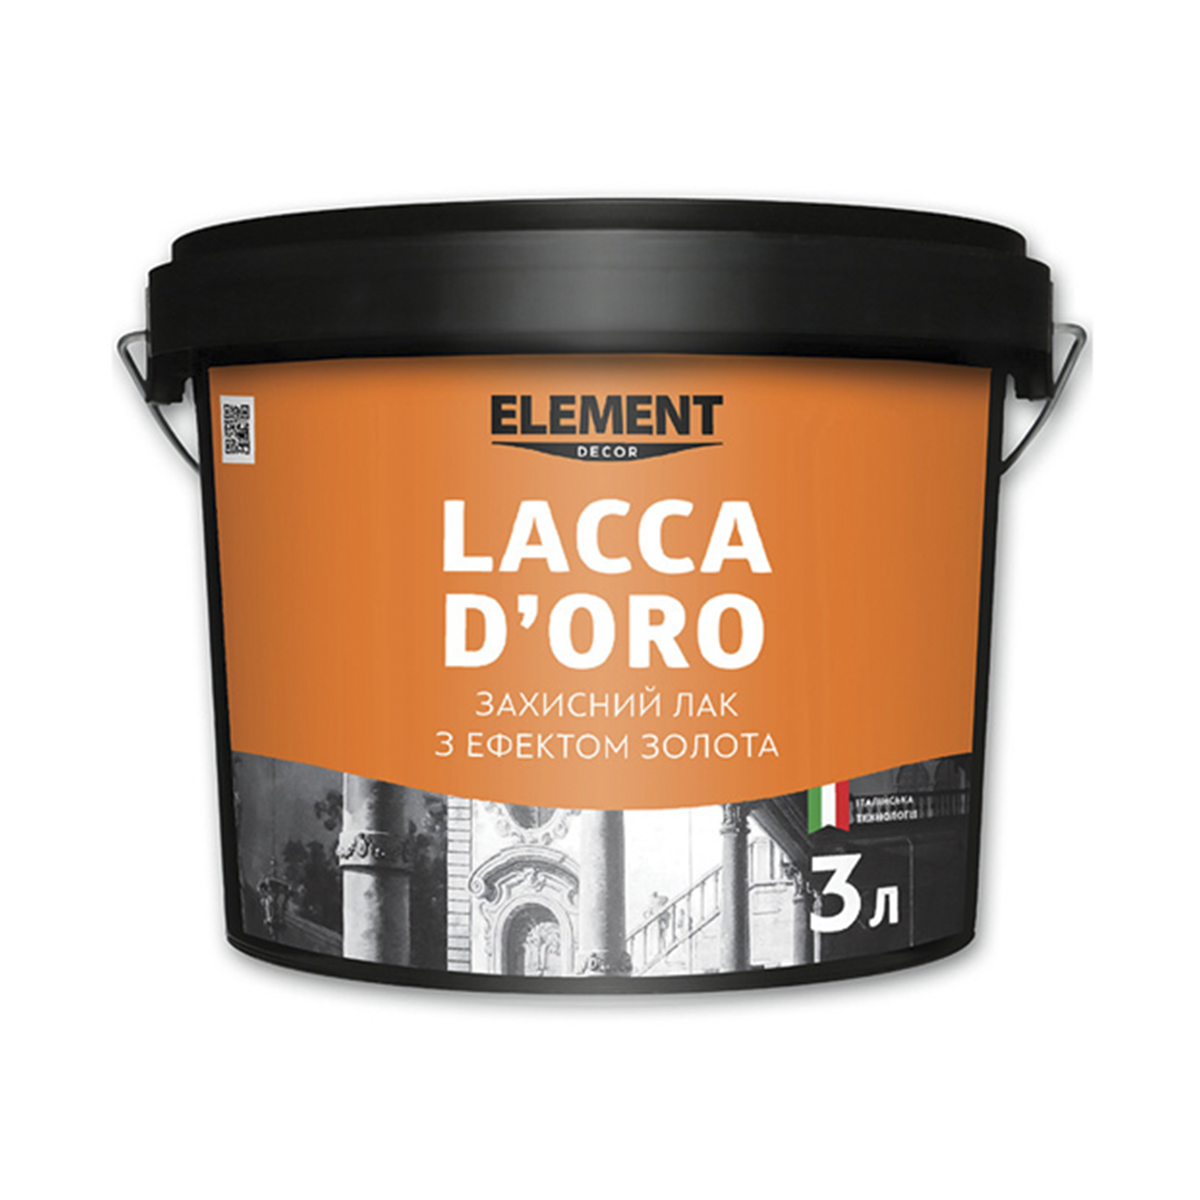 Лак Element Decor Lacca D'oro з ефектом золота 3л